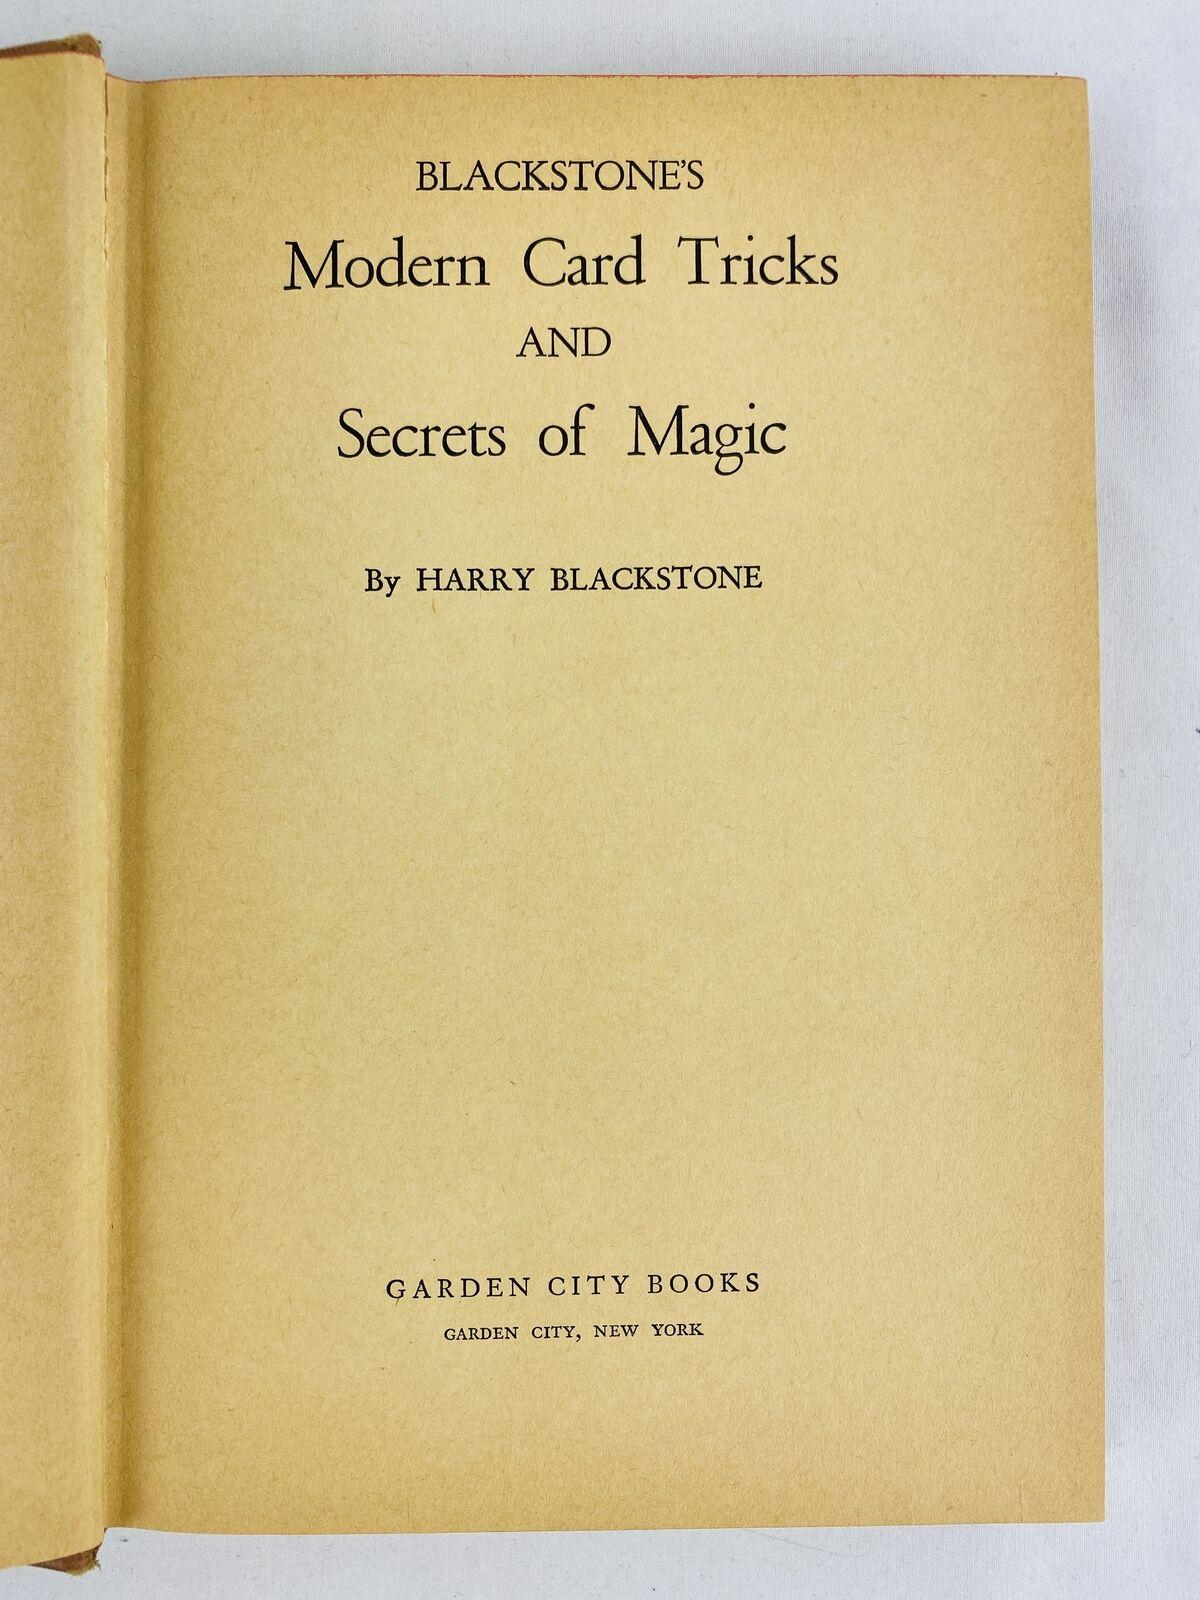 1941 Harry Blackstone's Modern Card Tricks and Secrets of Magic